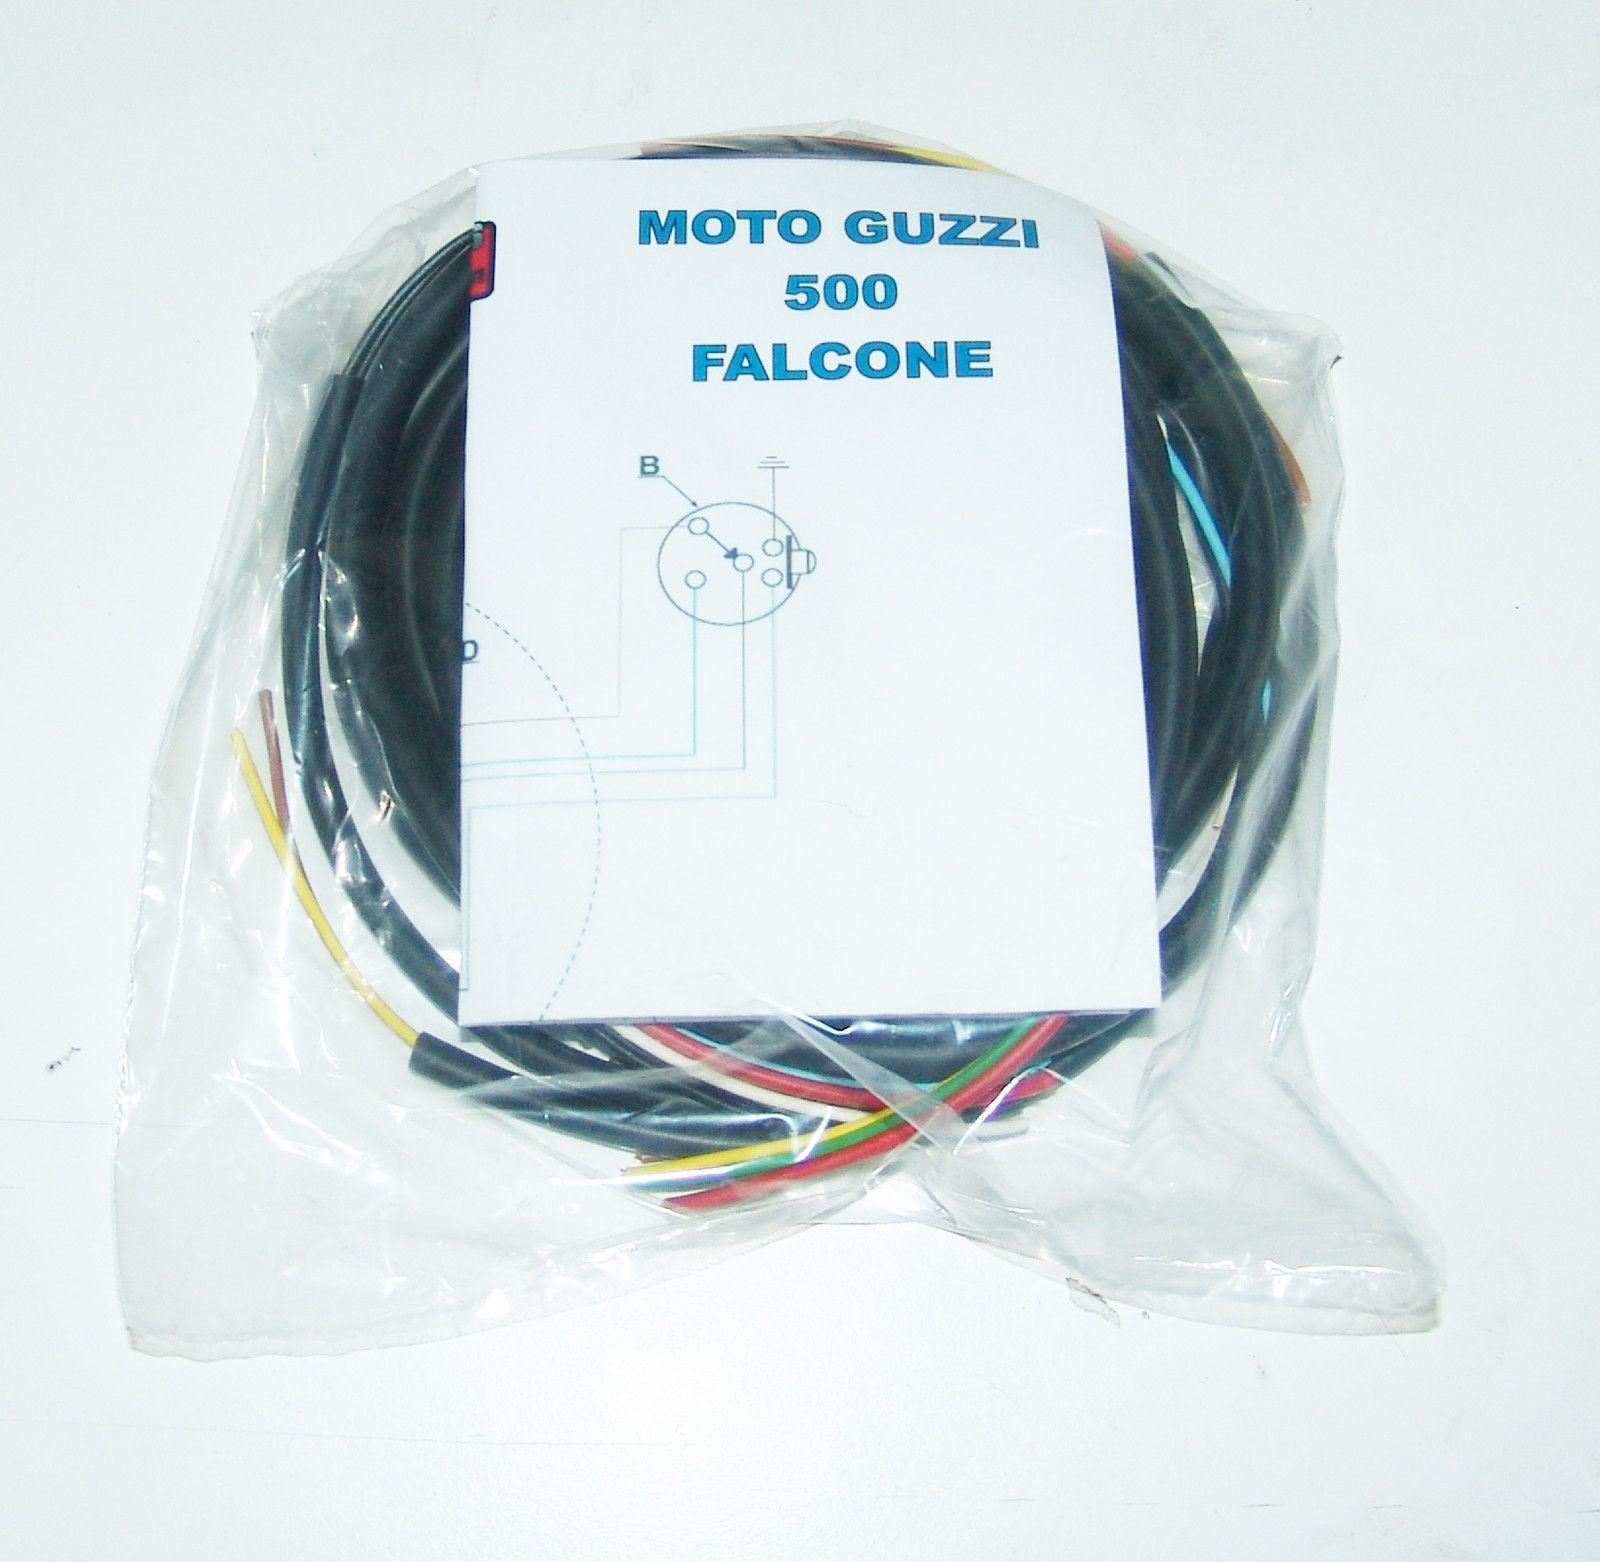 Schemi Elettrici Guzzi : Impianto elettrico electrical wiring moto guzzi falcone